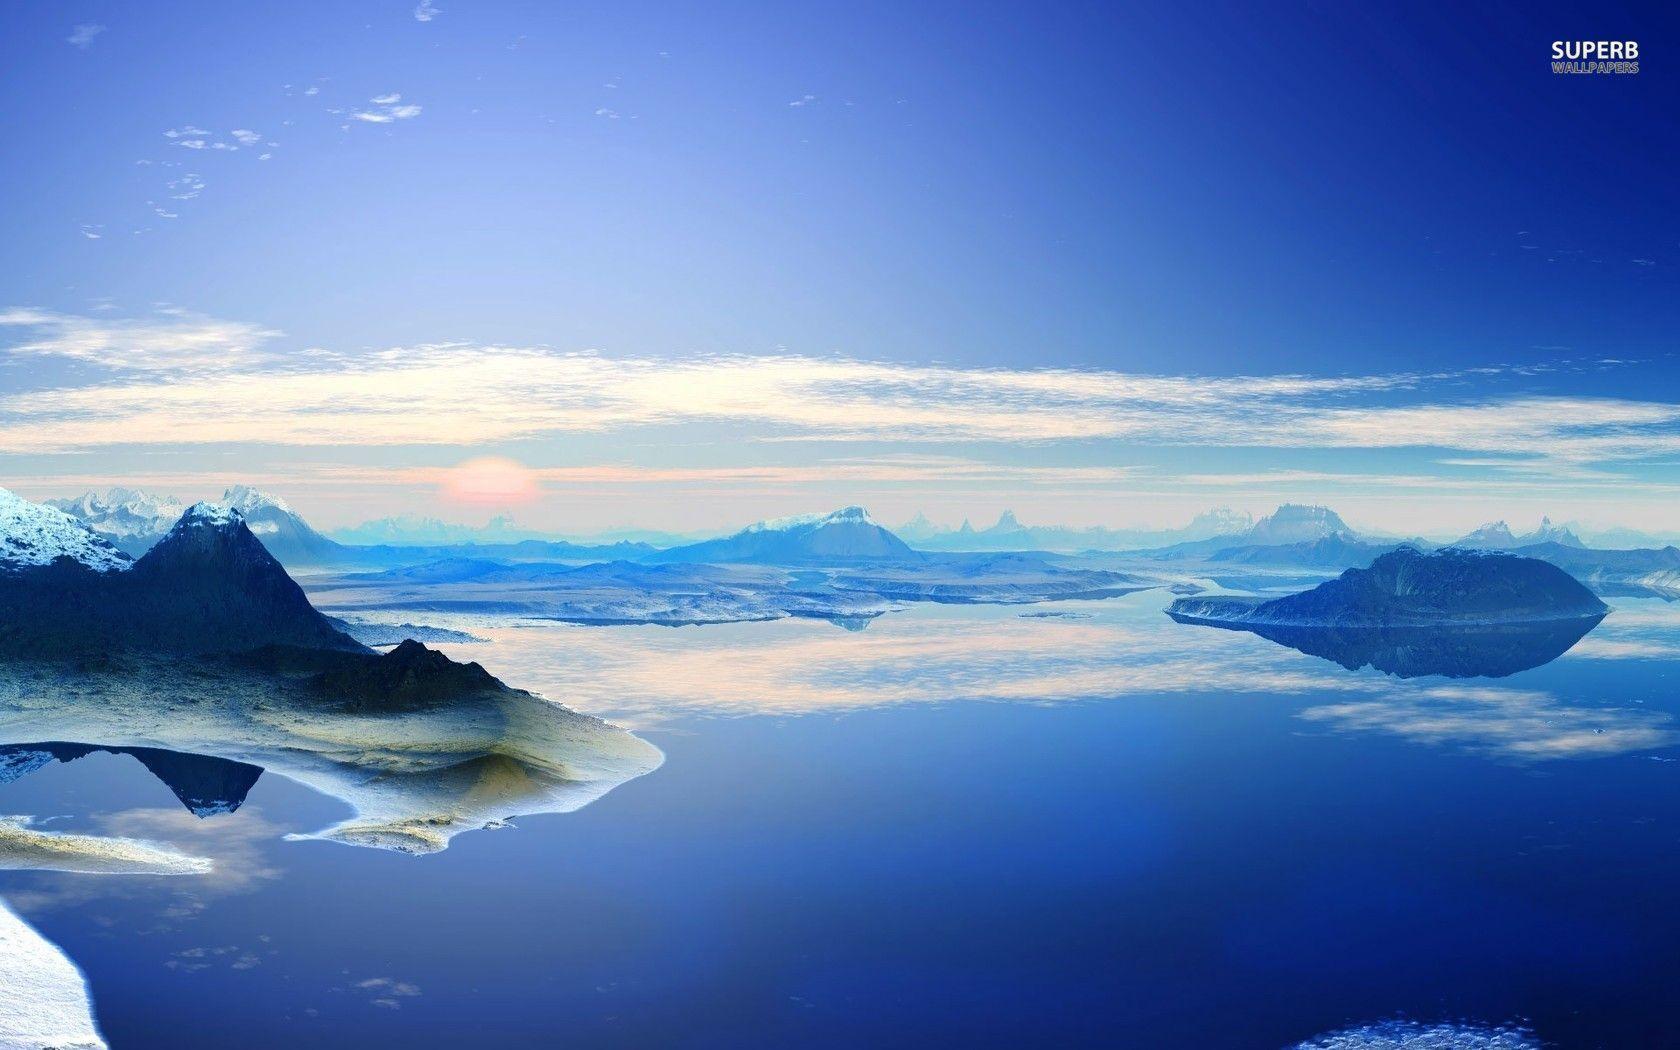 Antarctica Wallpaper : Antarctica Wallpaper Nature Wallpapers ...